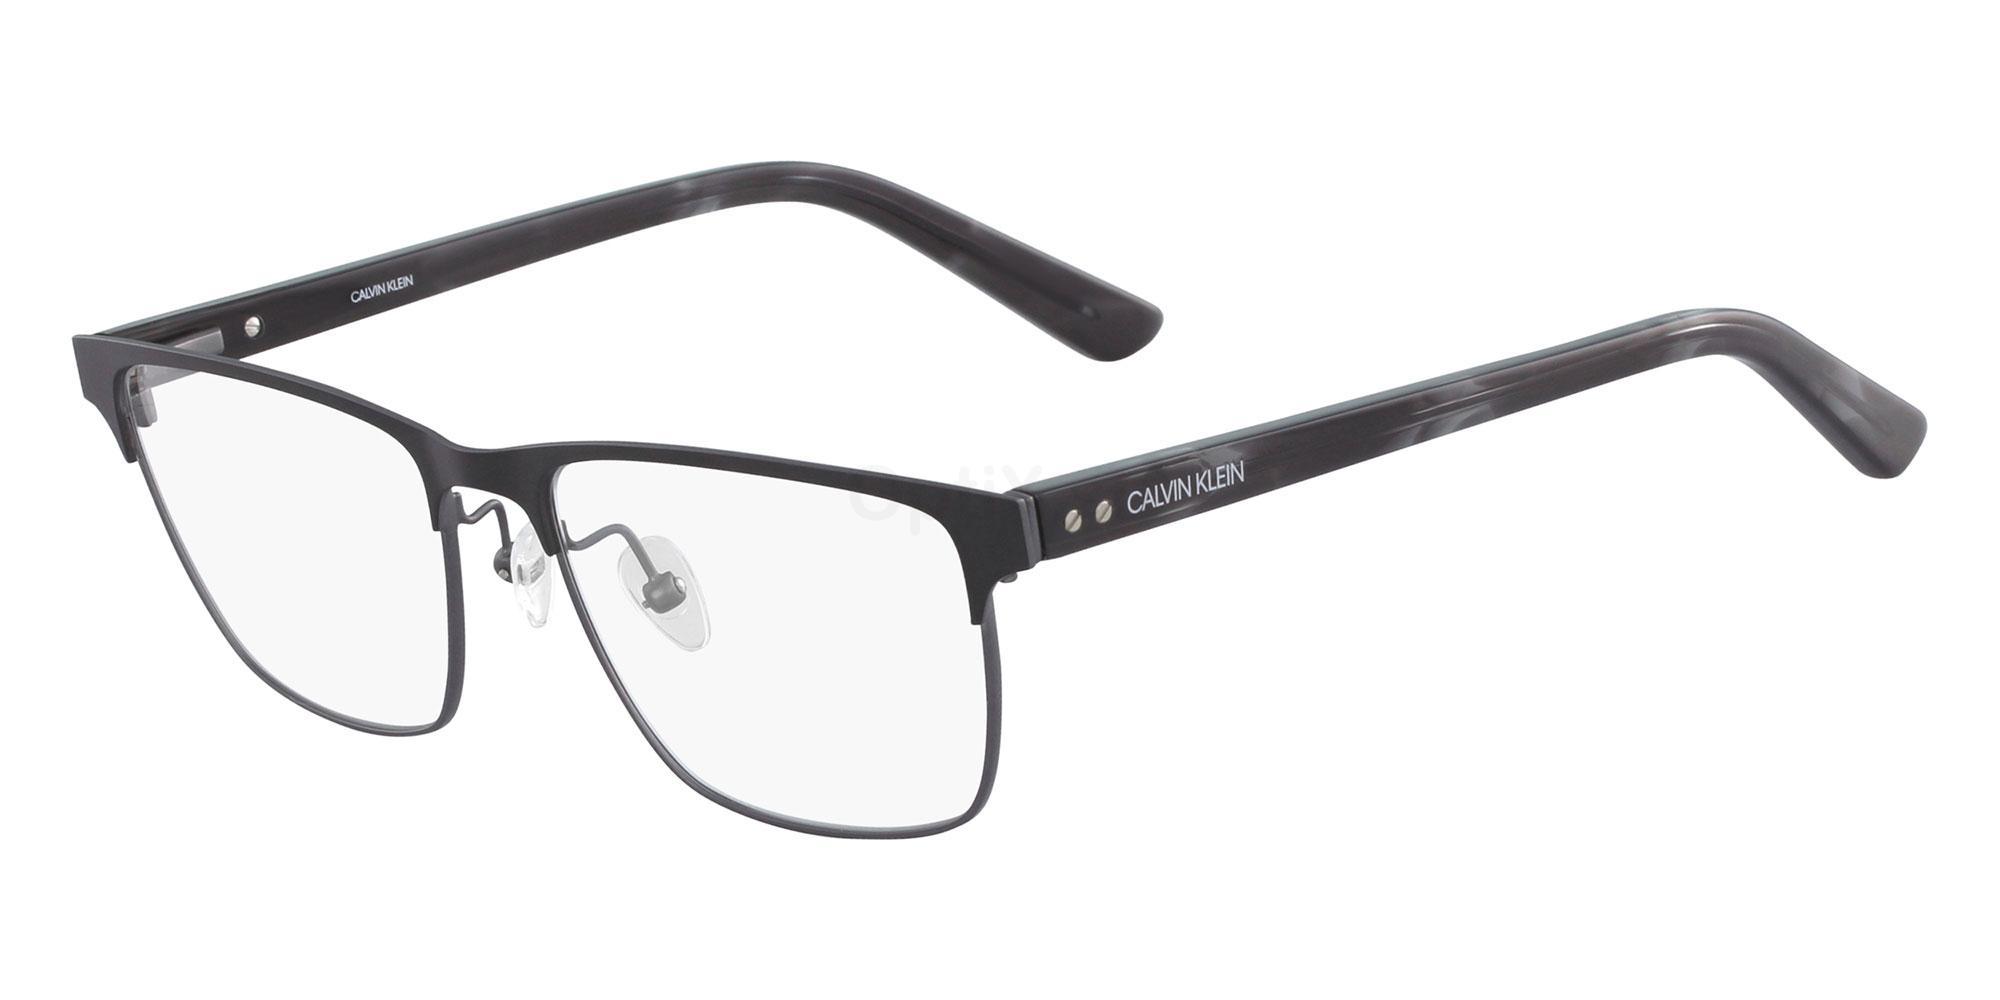 001 CK18304 Glasses, Calvin Klein